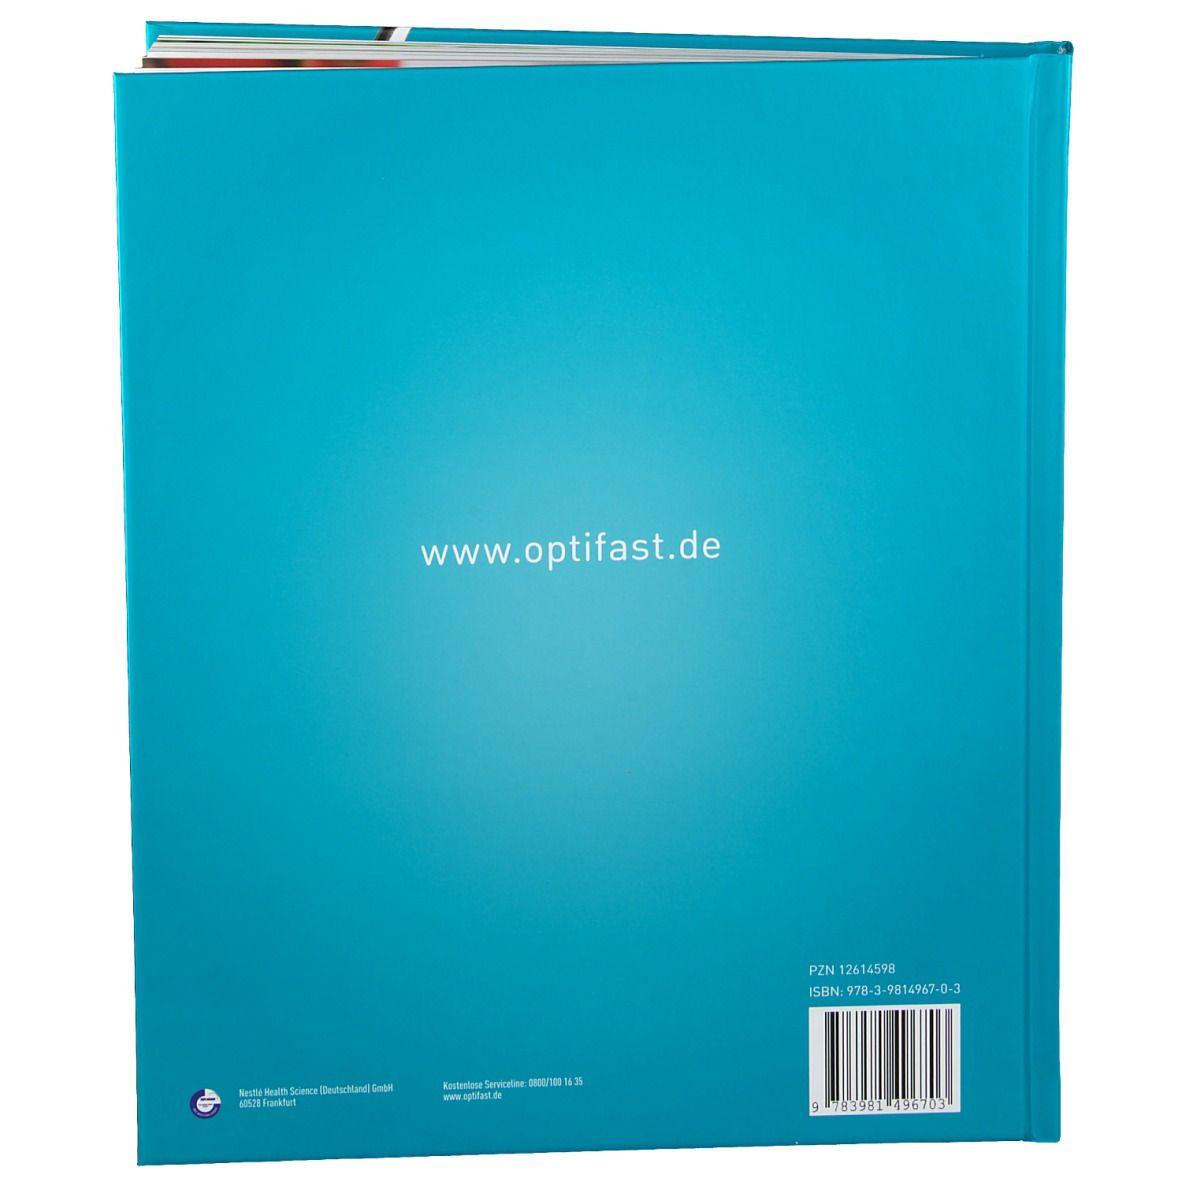 OPTIFAST® Kochbuch